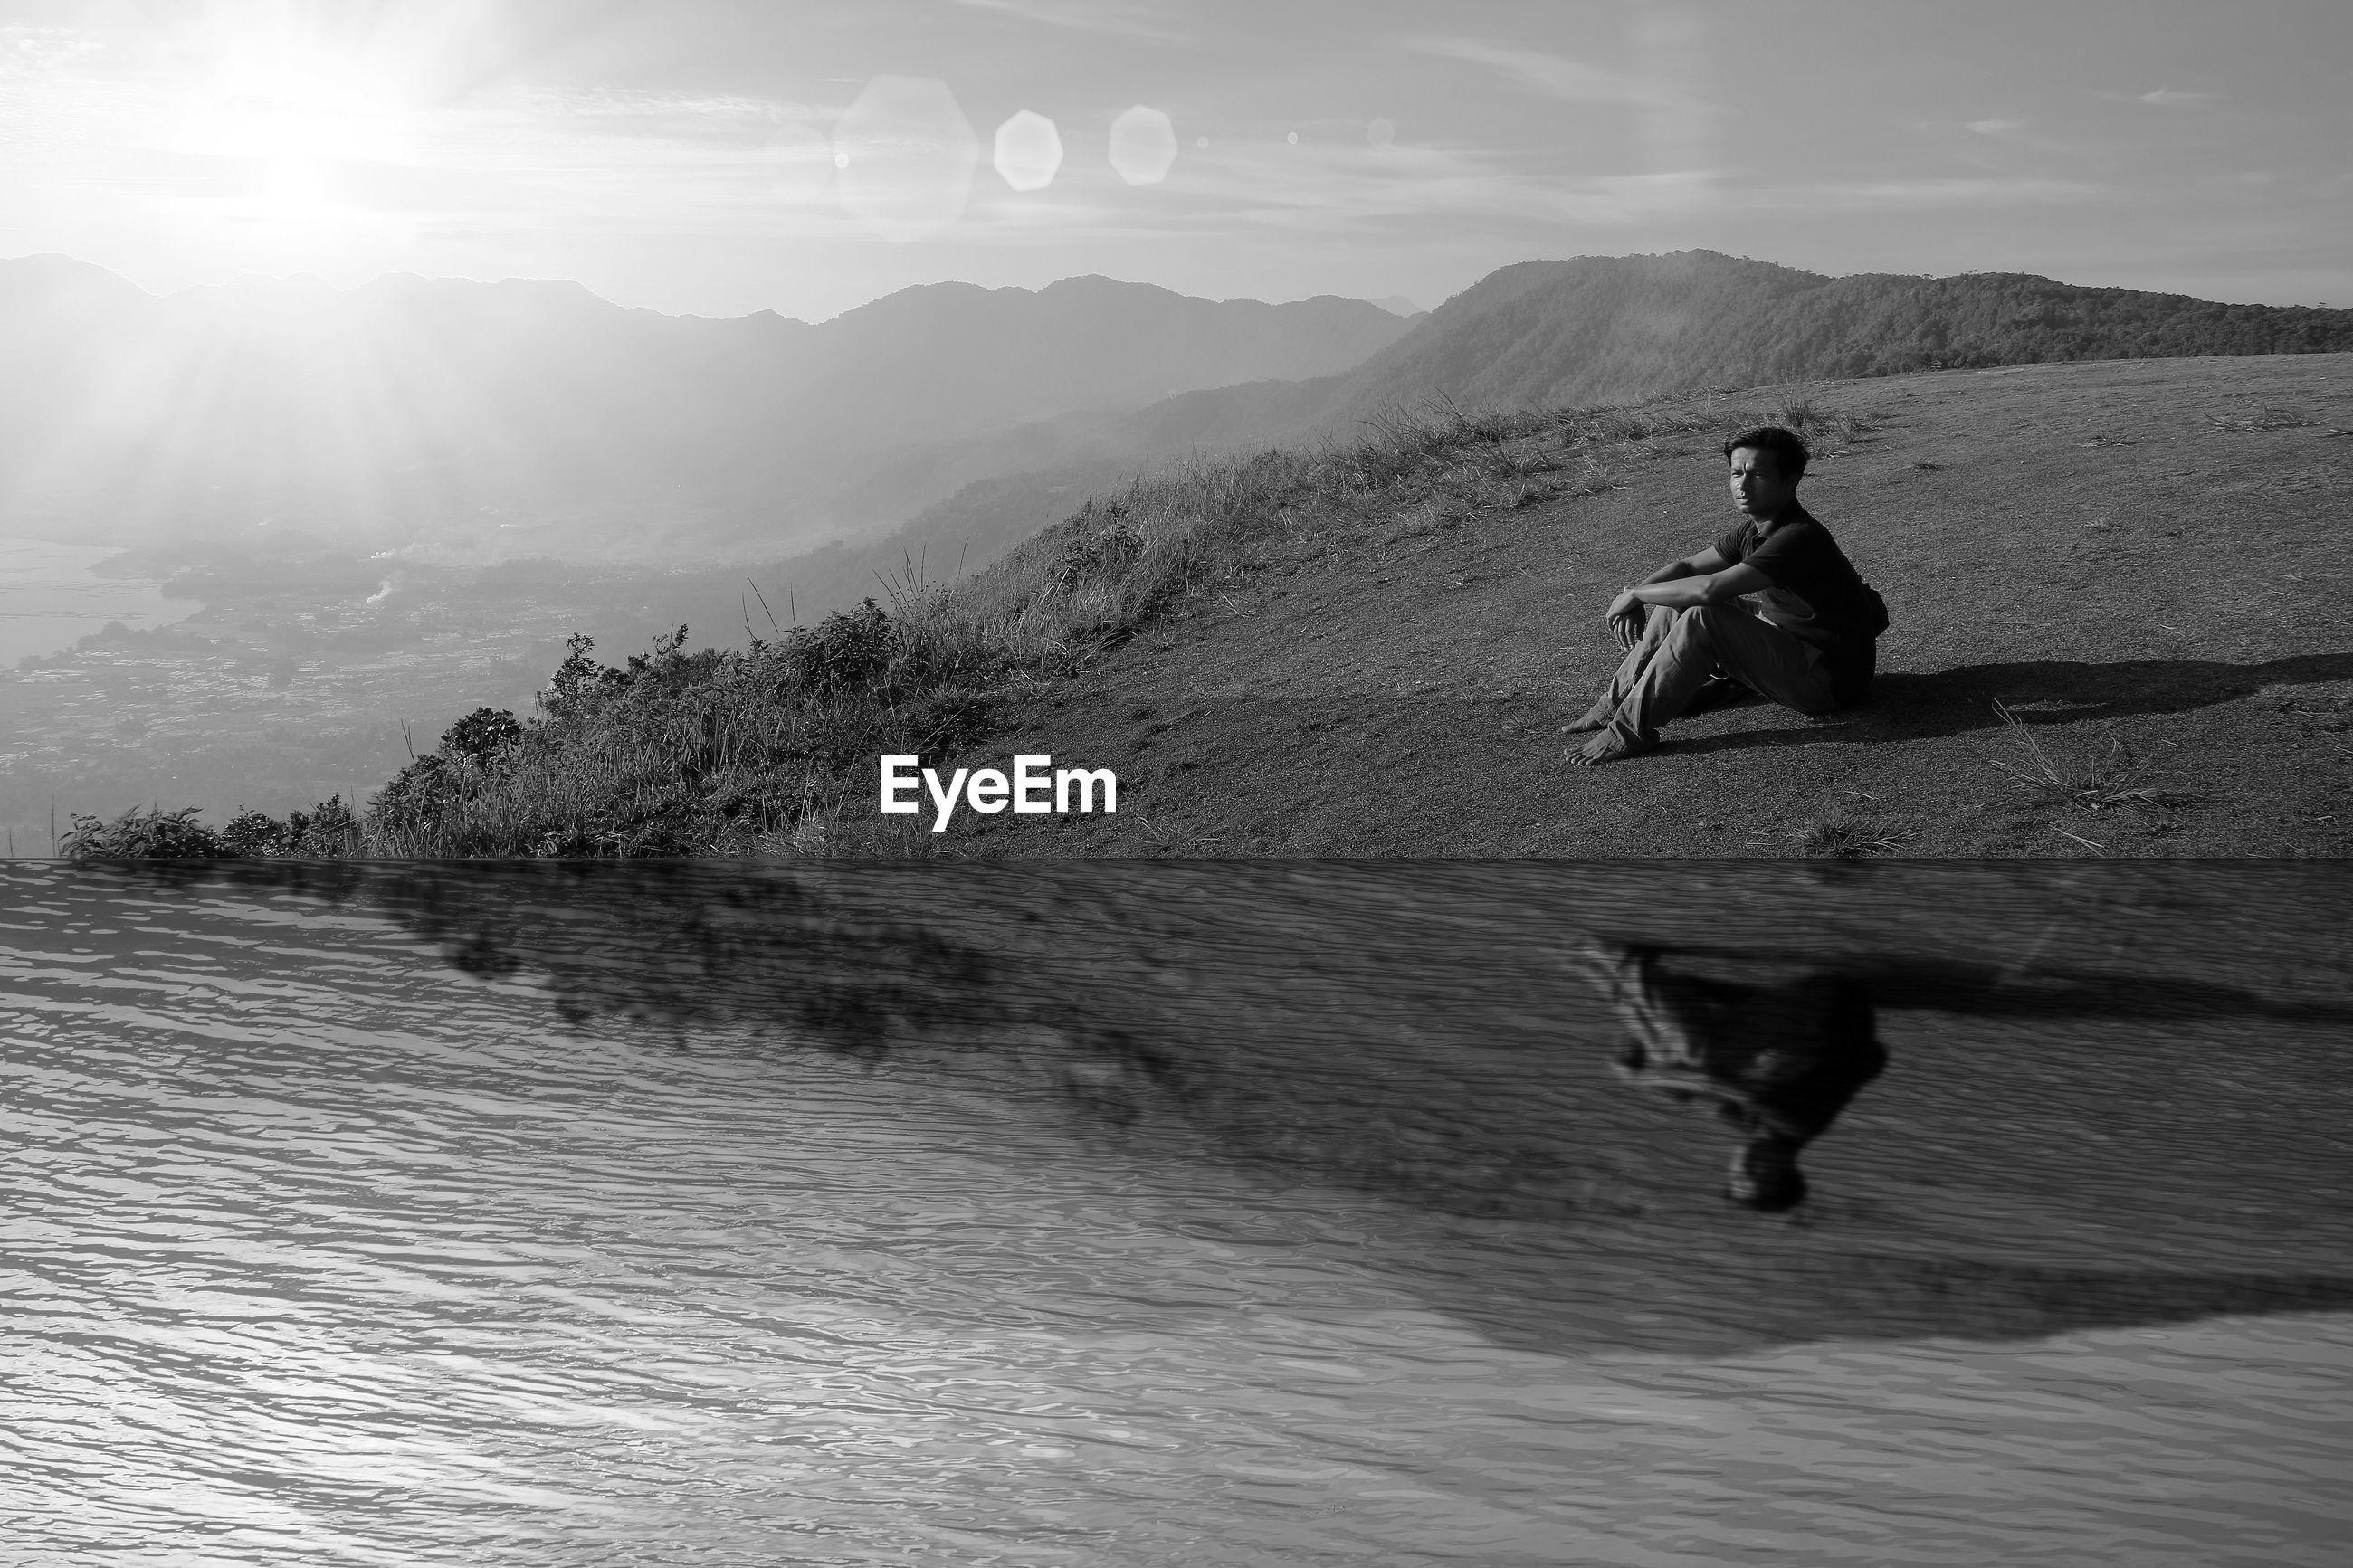 Reflection of man sitting at shore on lake